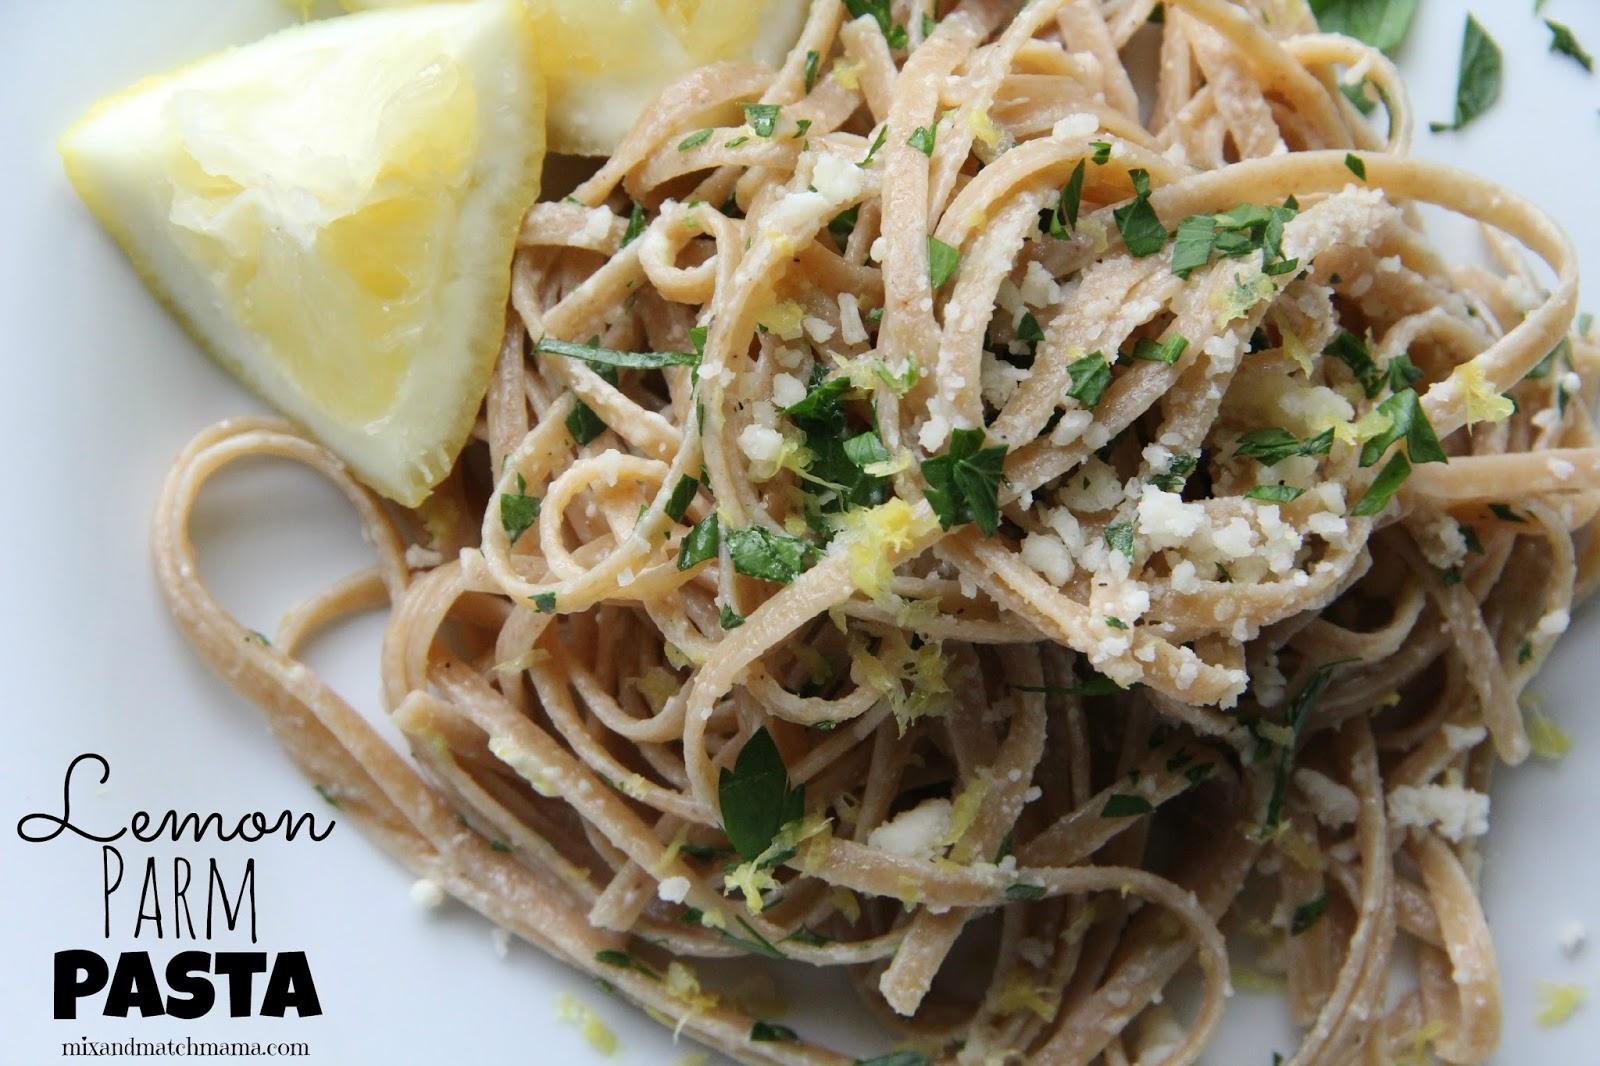 Mix and Match Mama: Dinner Tonight: Lemon Parm Pasta